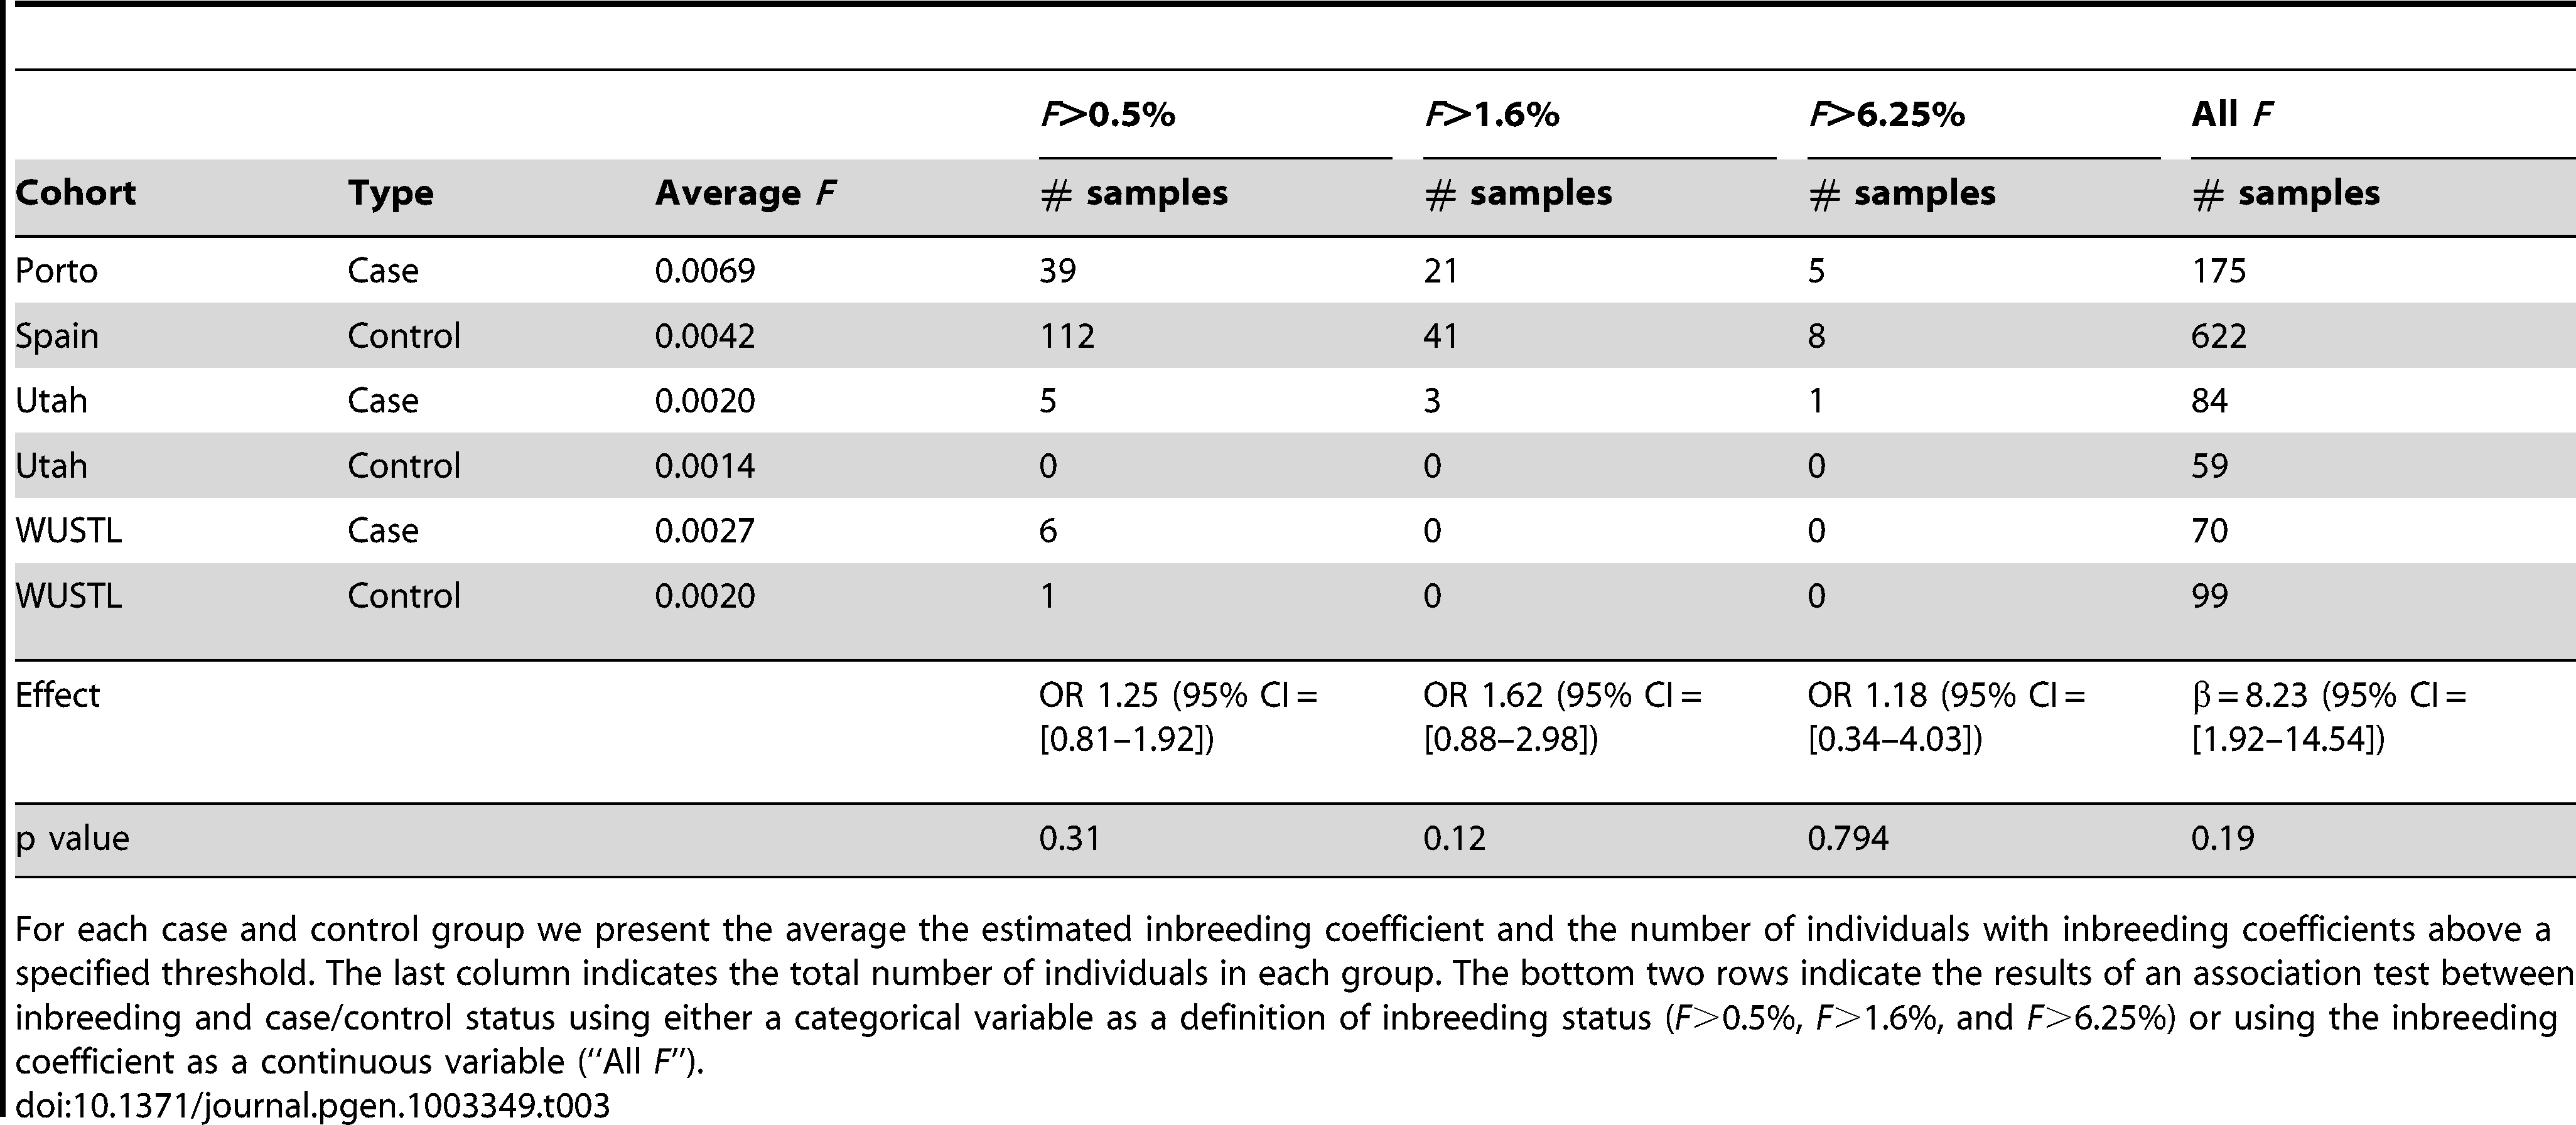 Summary of inbreeding coefficient estimates across cohorts, and association testing.